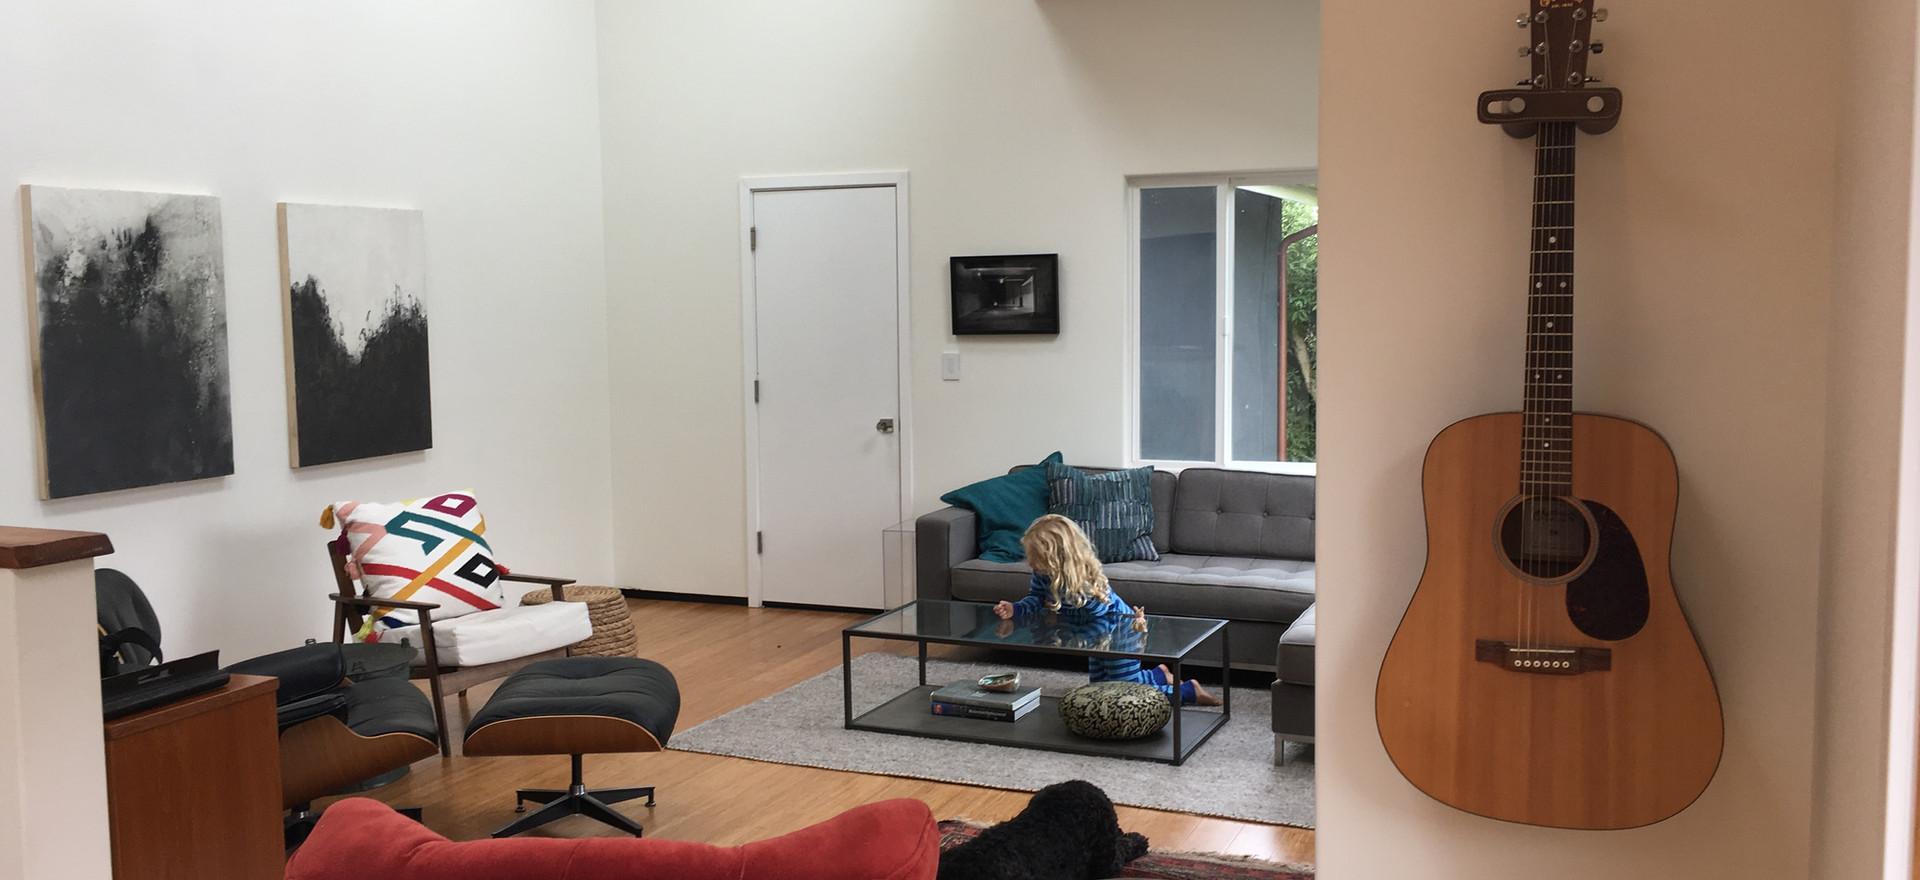 Full Interior Remodel